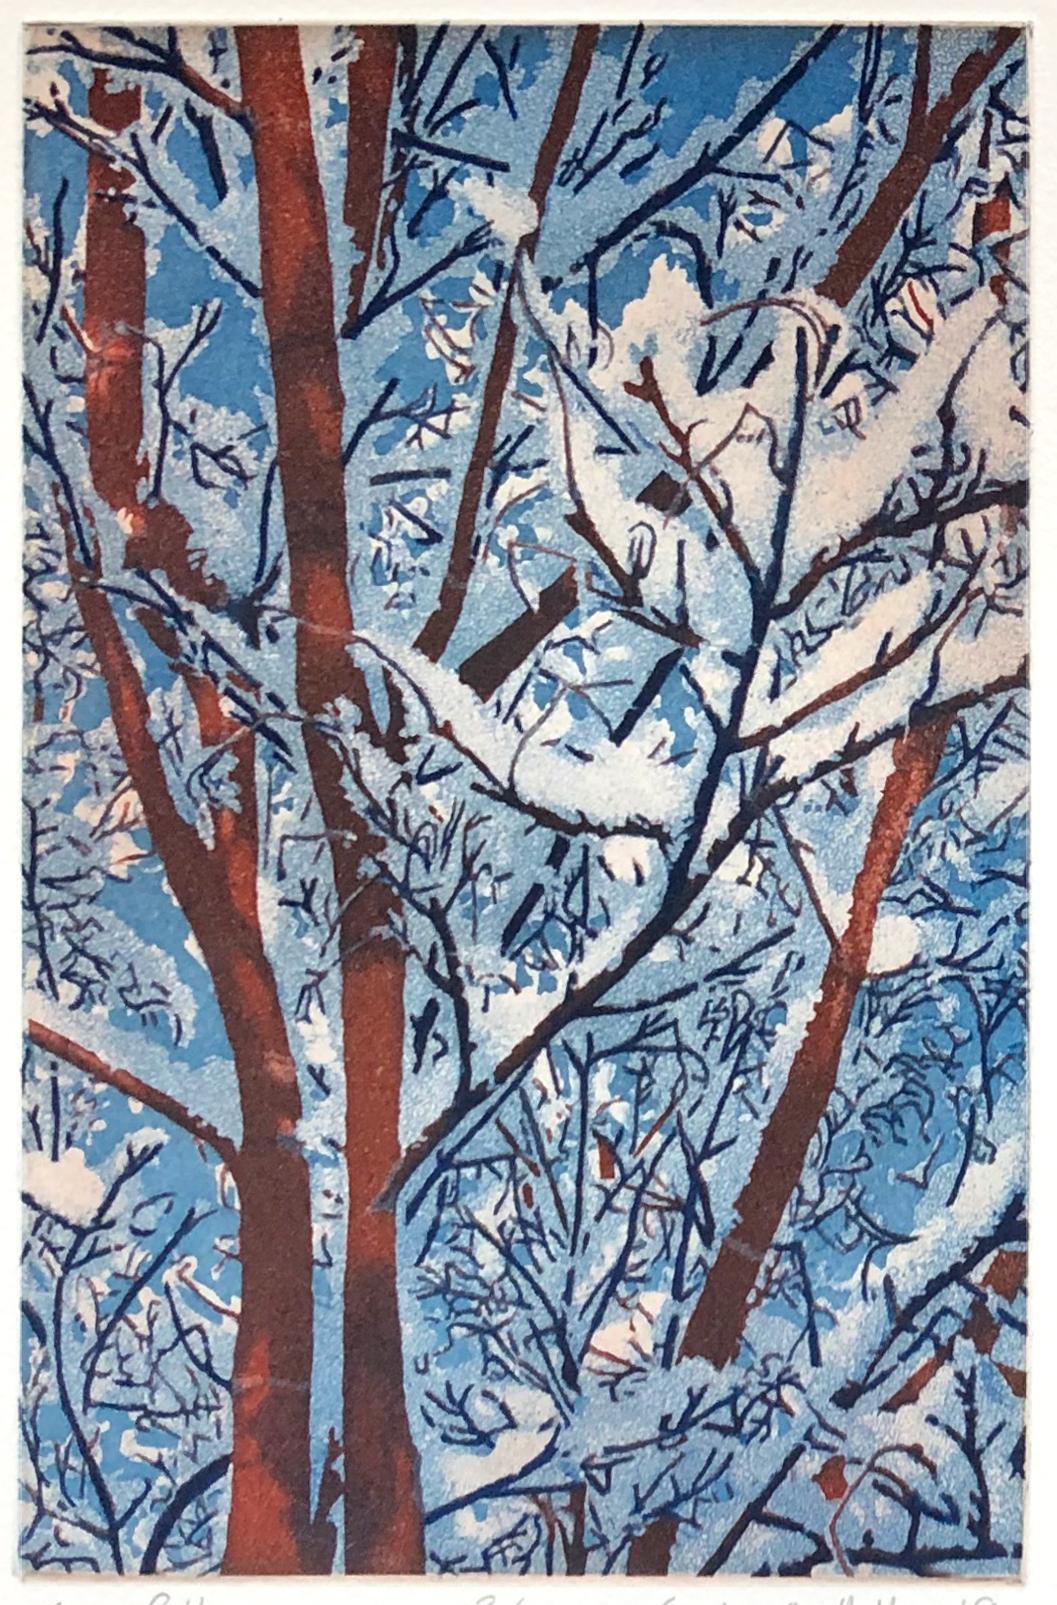 Snowfall, by Stephen McMillan